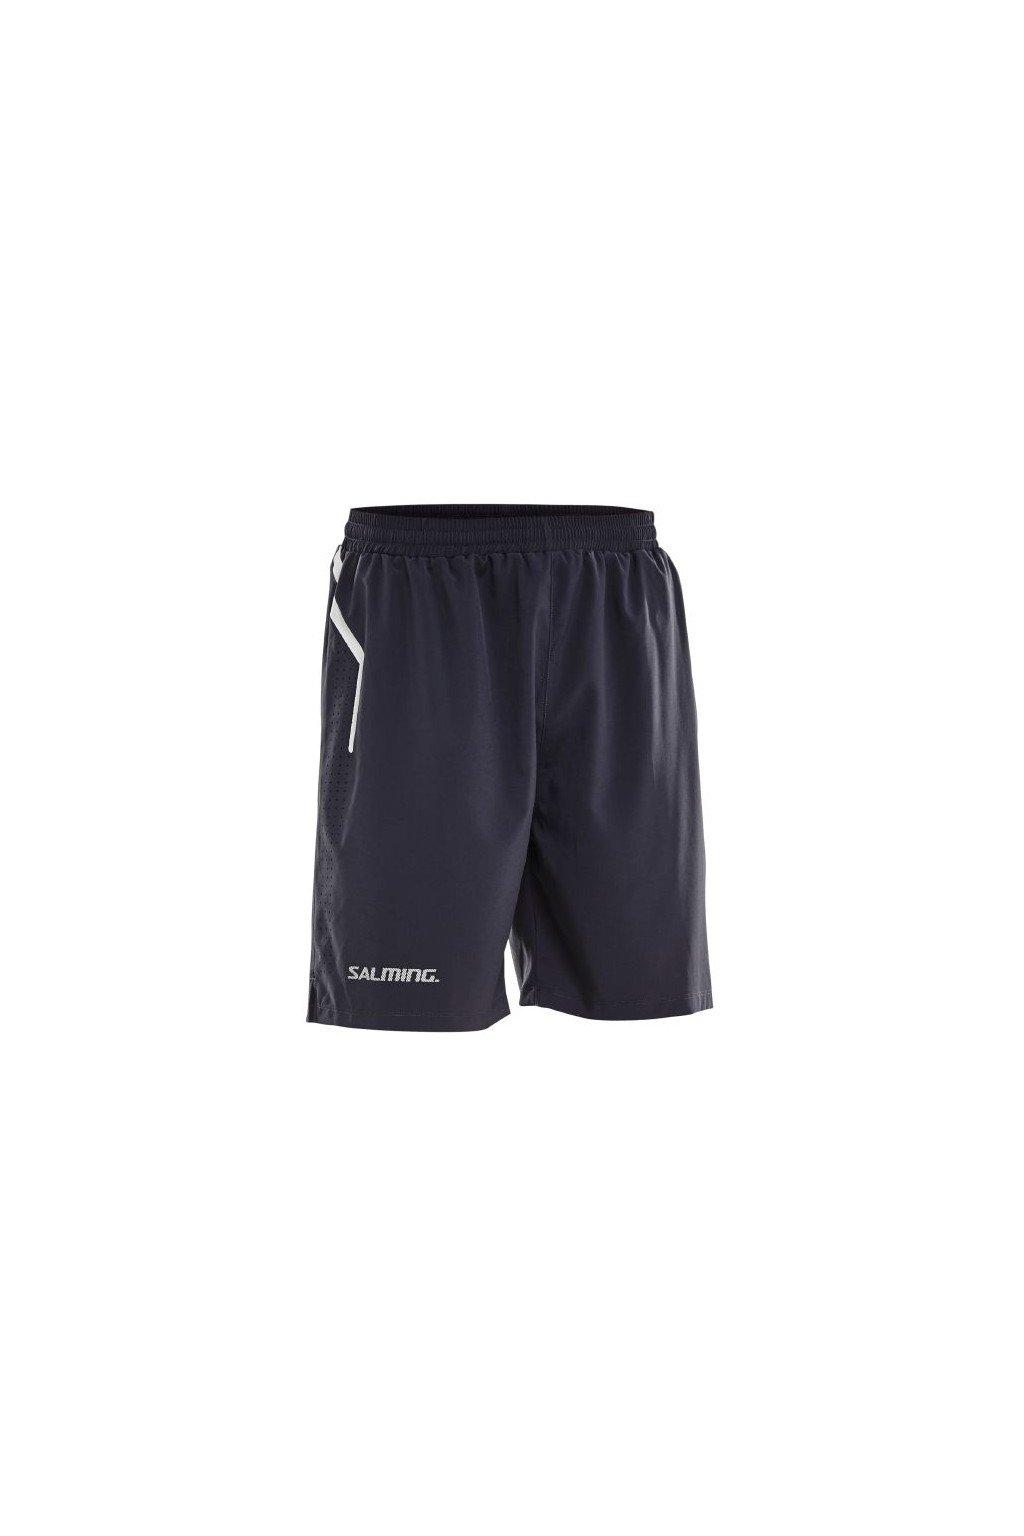 salming pro training shorts jr black 164